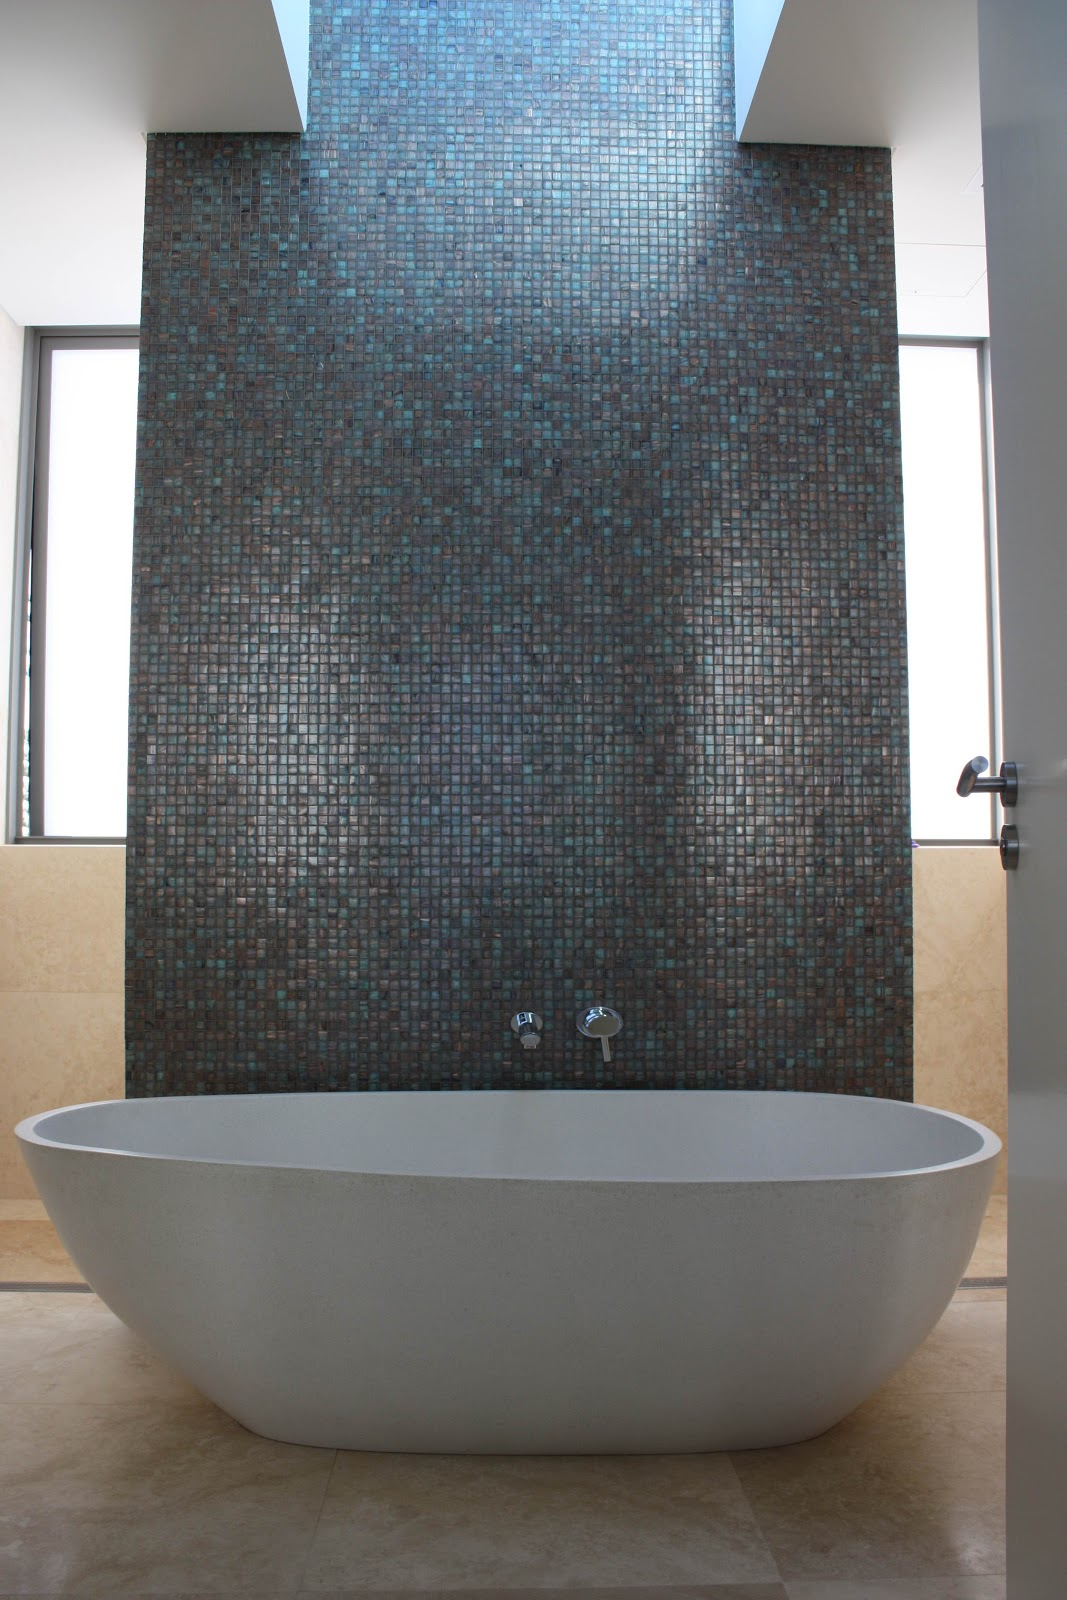 Minosa Travertine Bathrooms The Natural Choice Modern